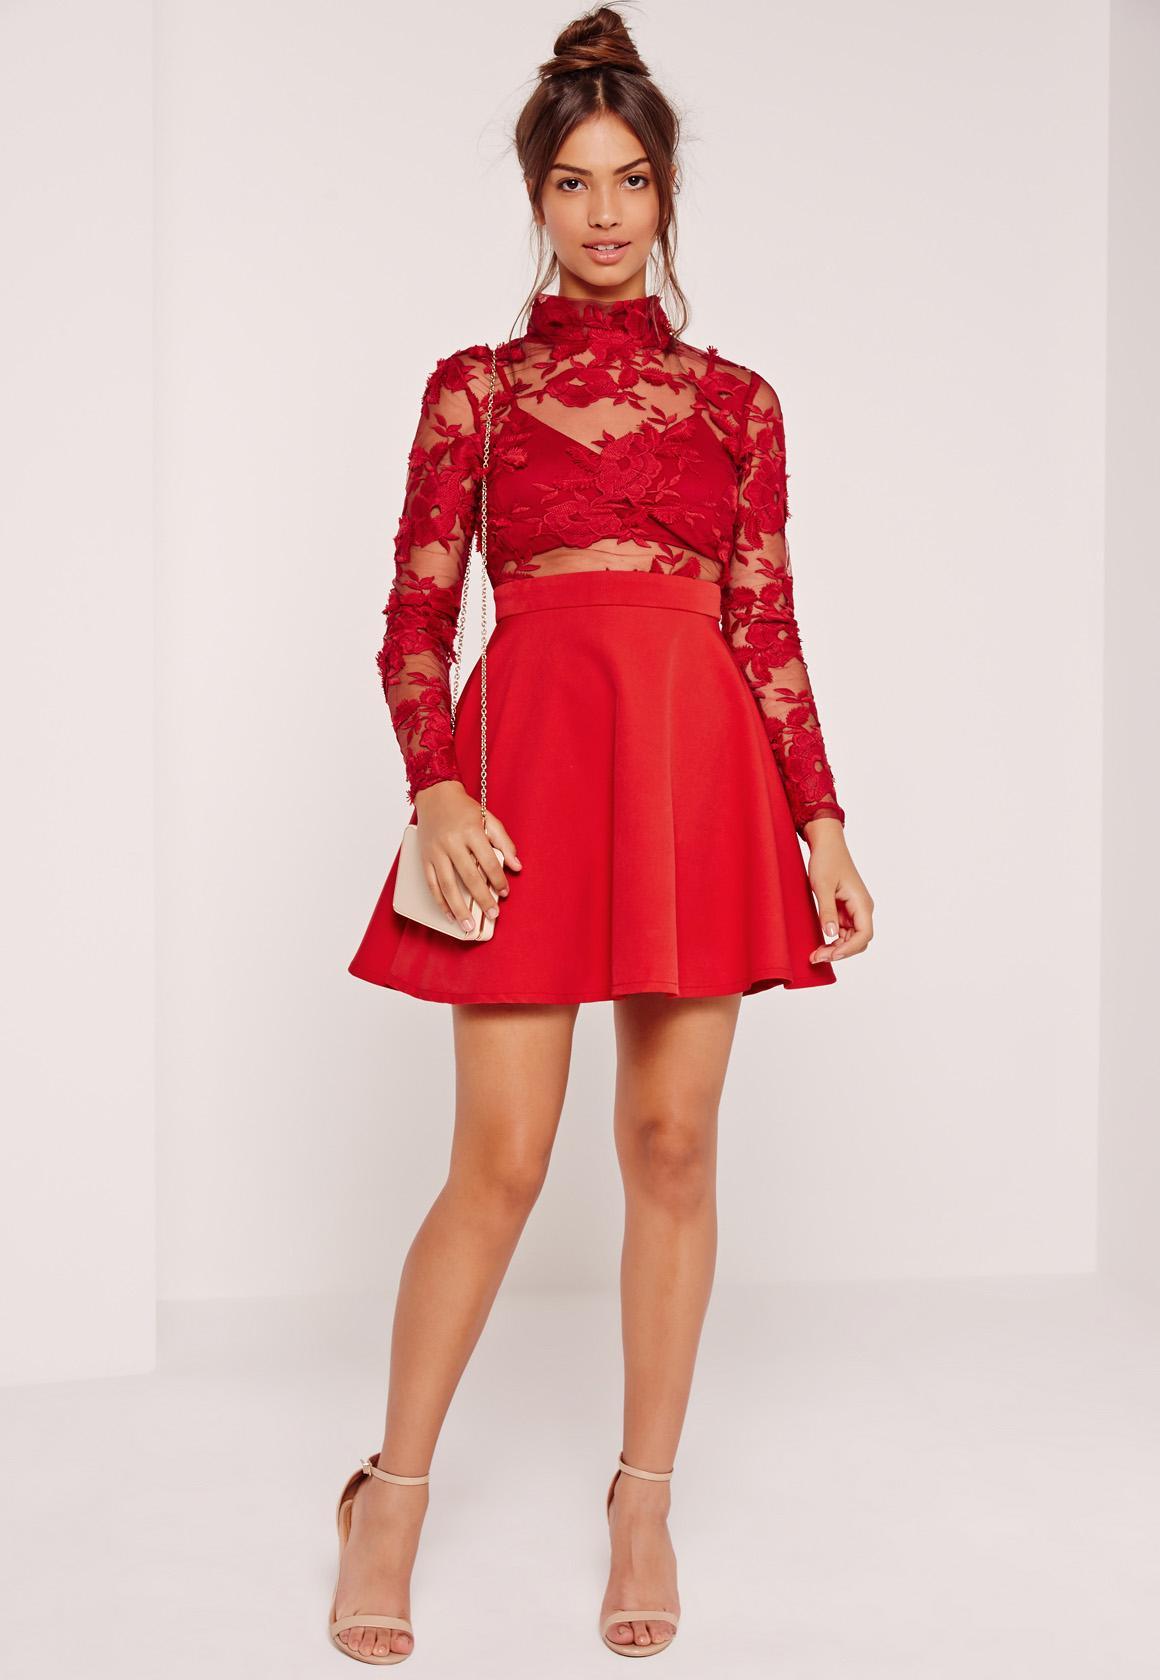 Robe noire col dentelle rouge